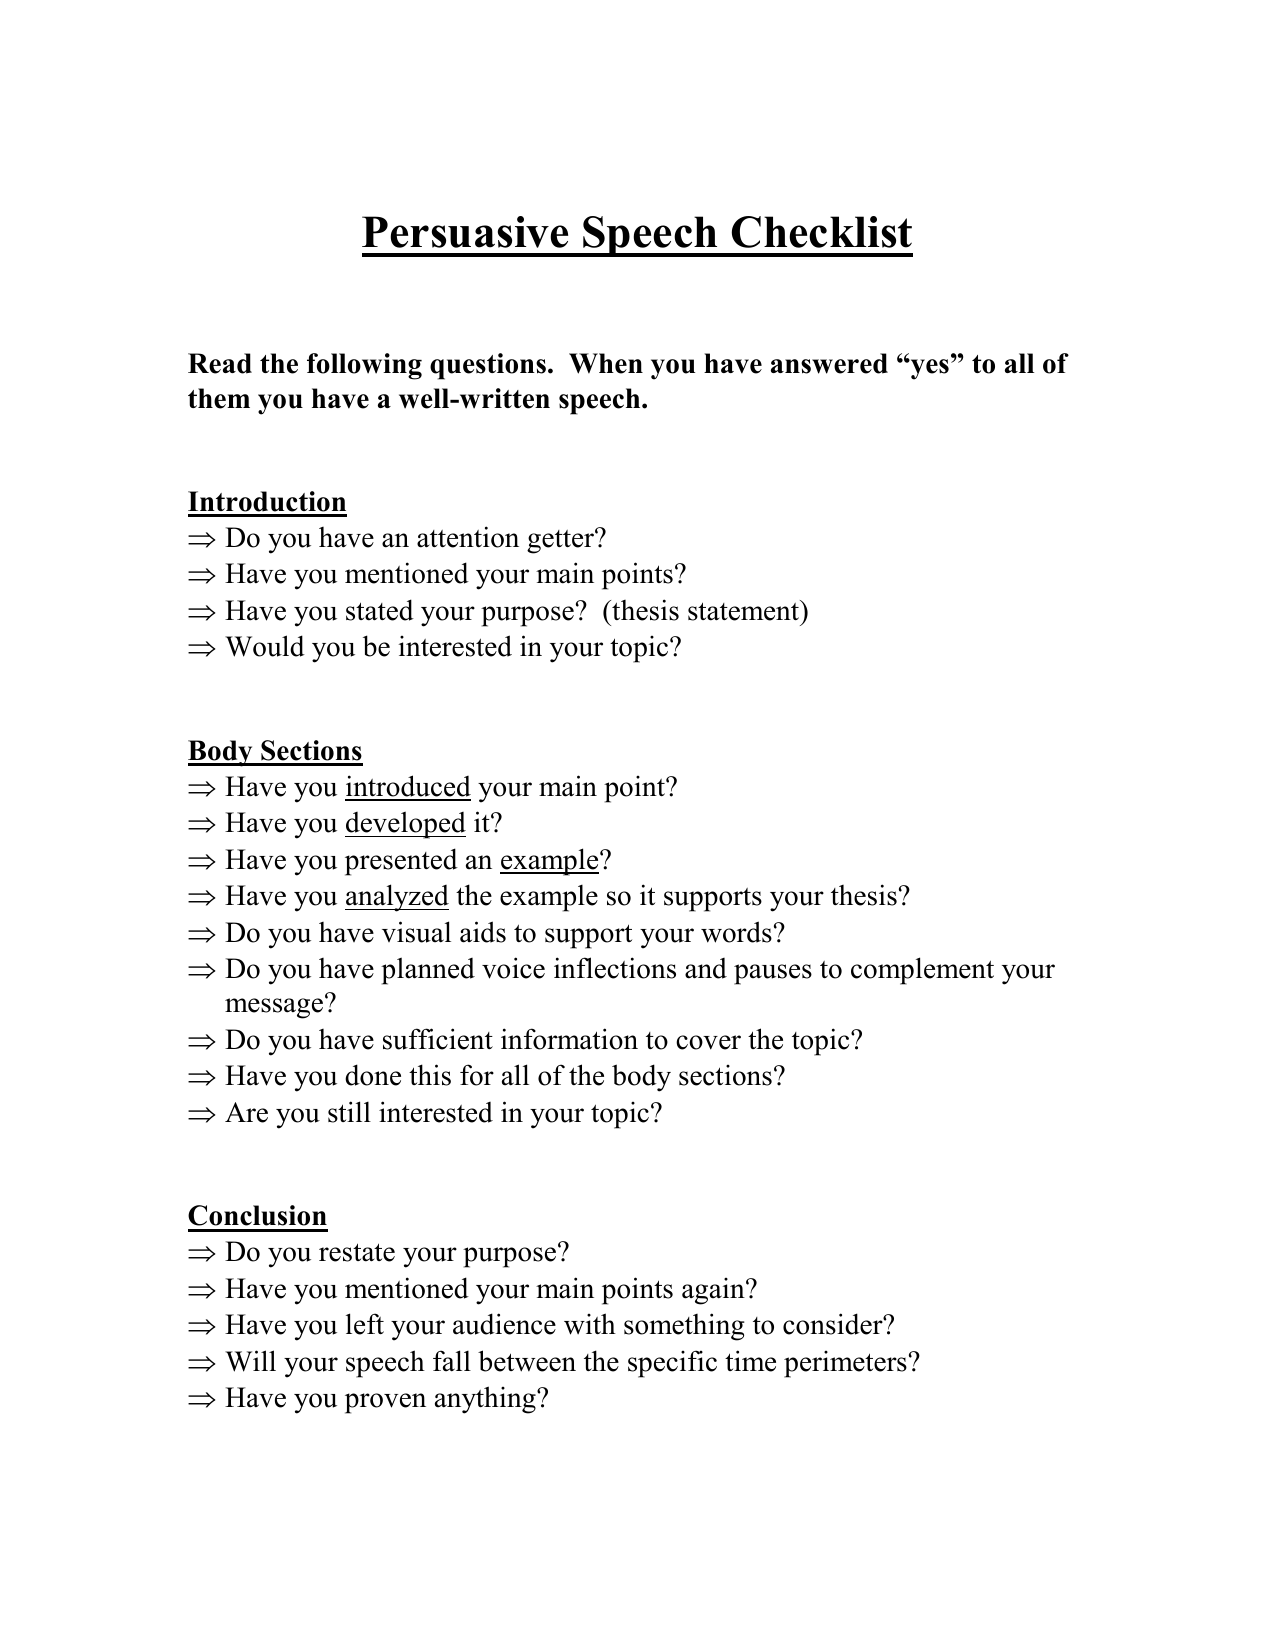 persuasive speech checklist